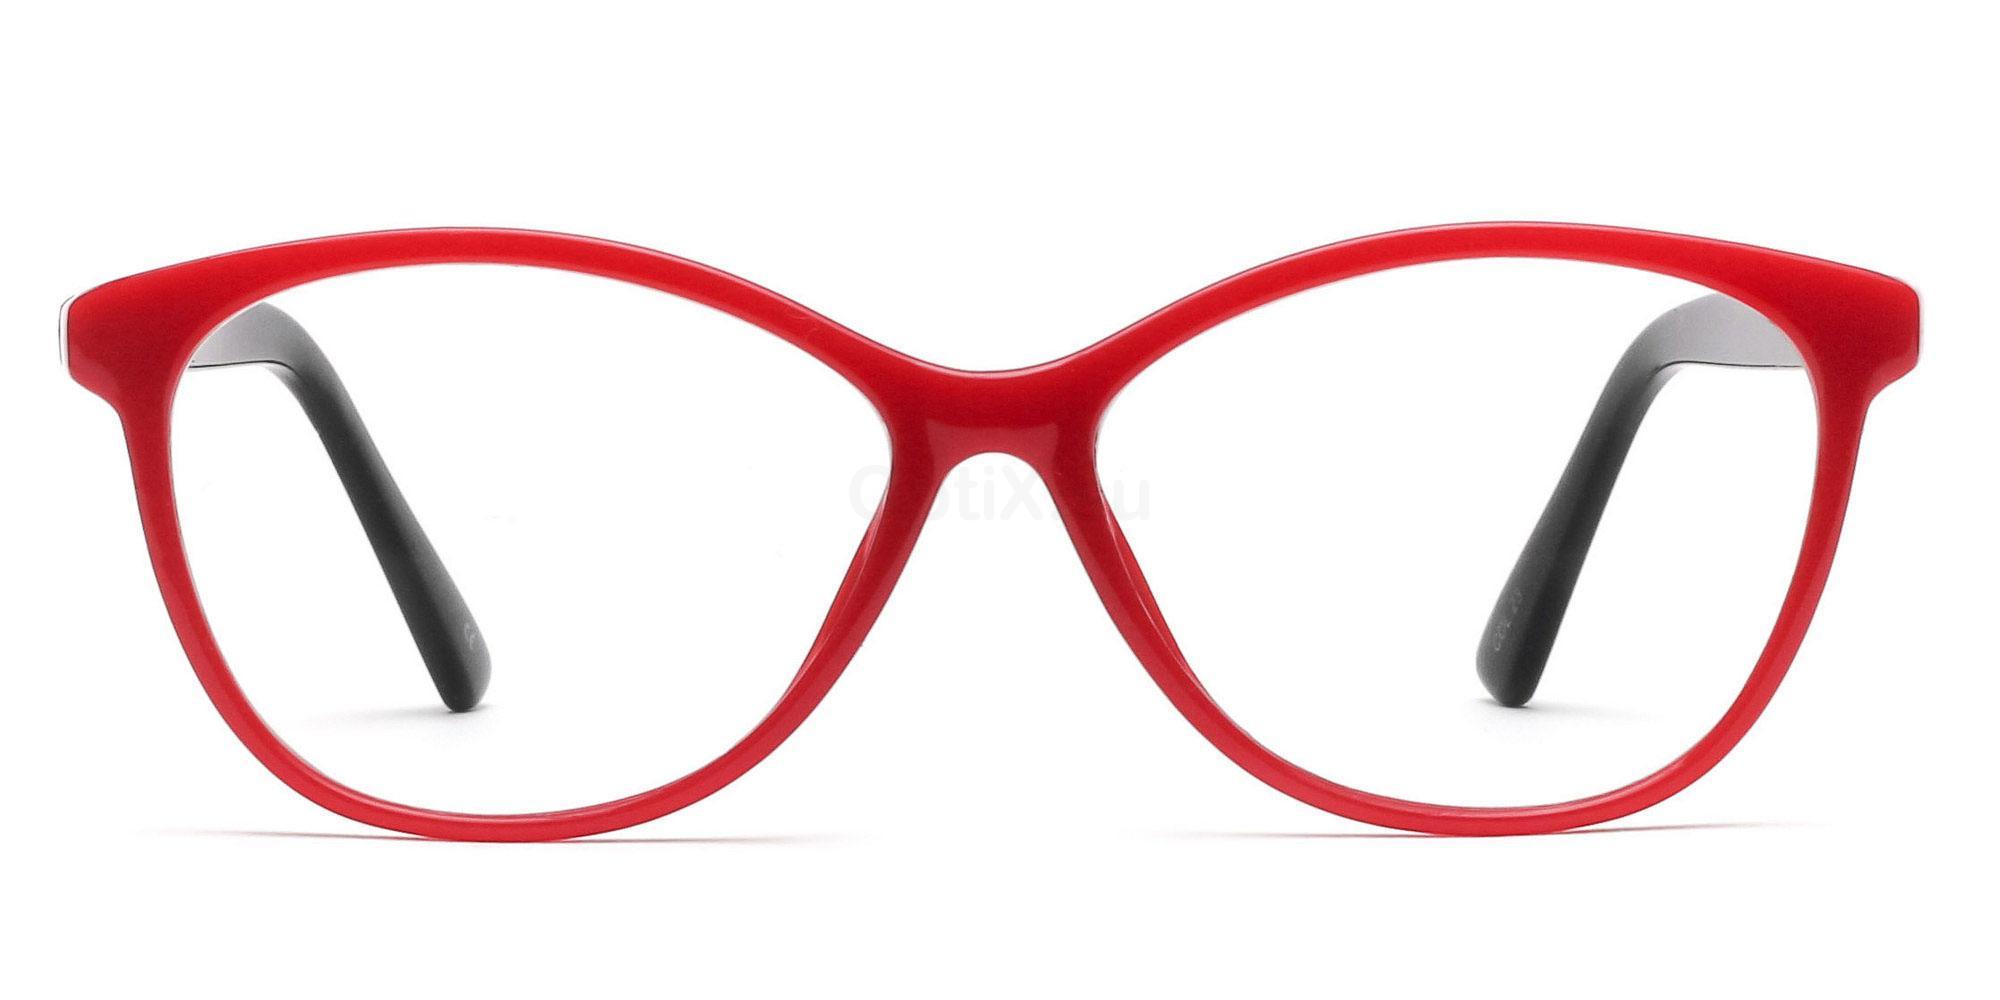 COL.23 2439 - Red and Black Glasses, Savannah